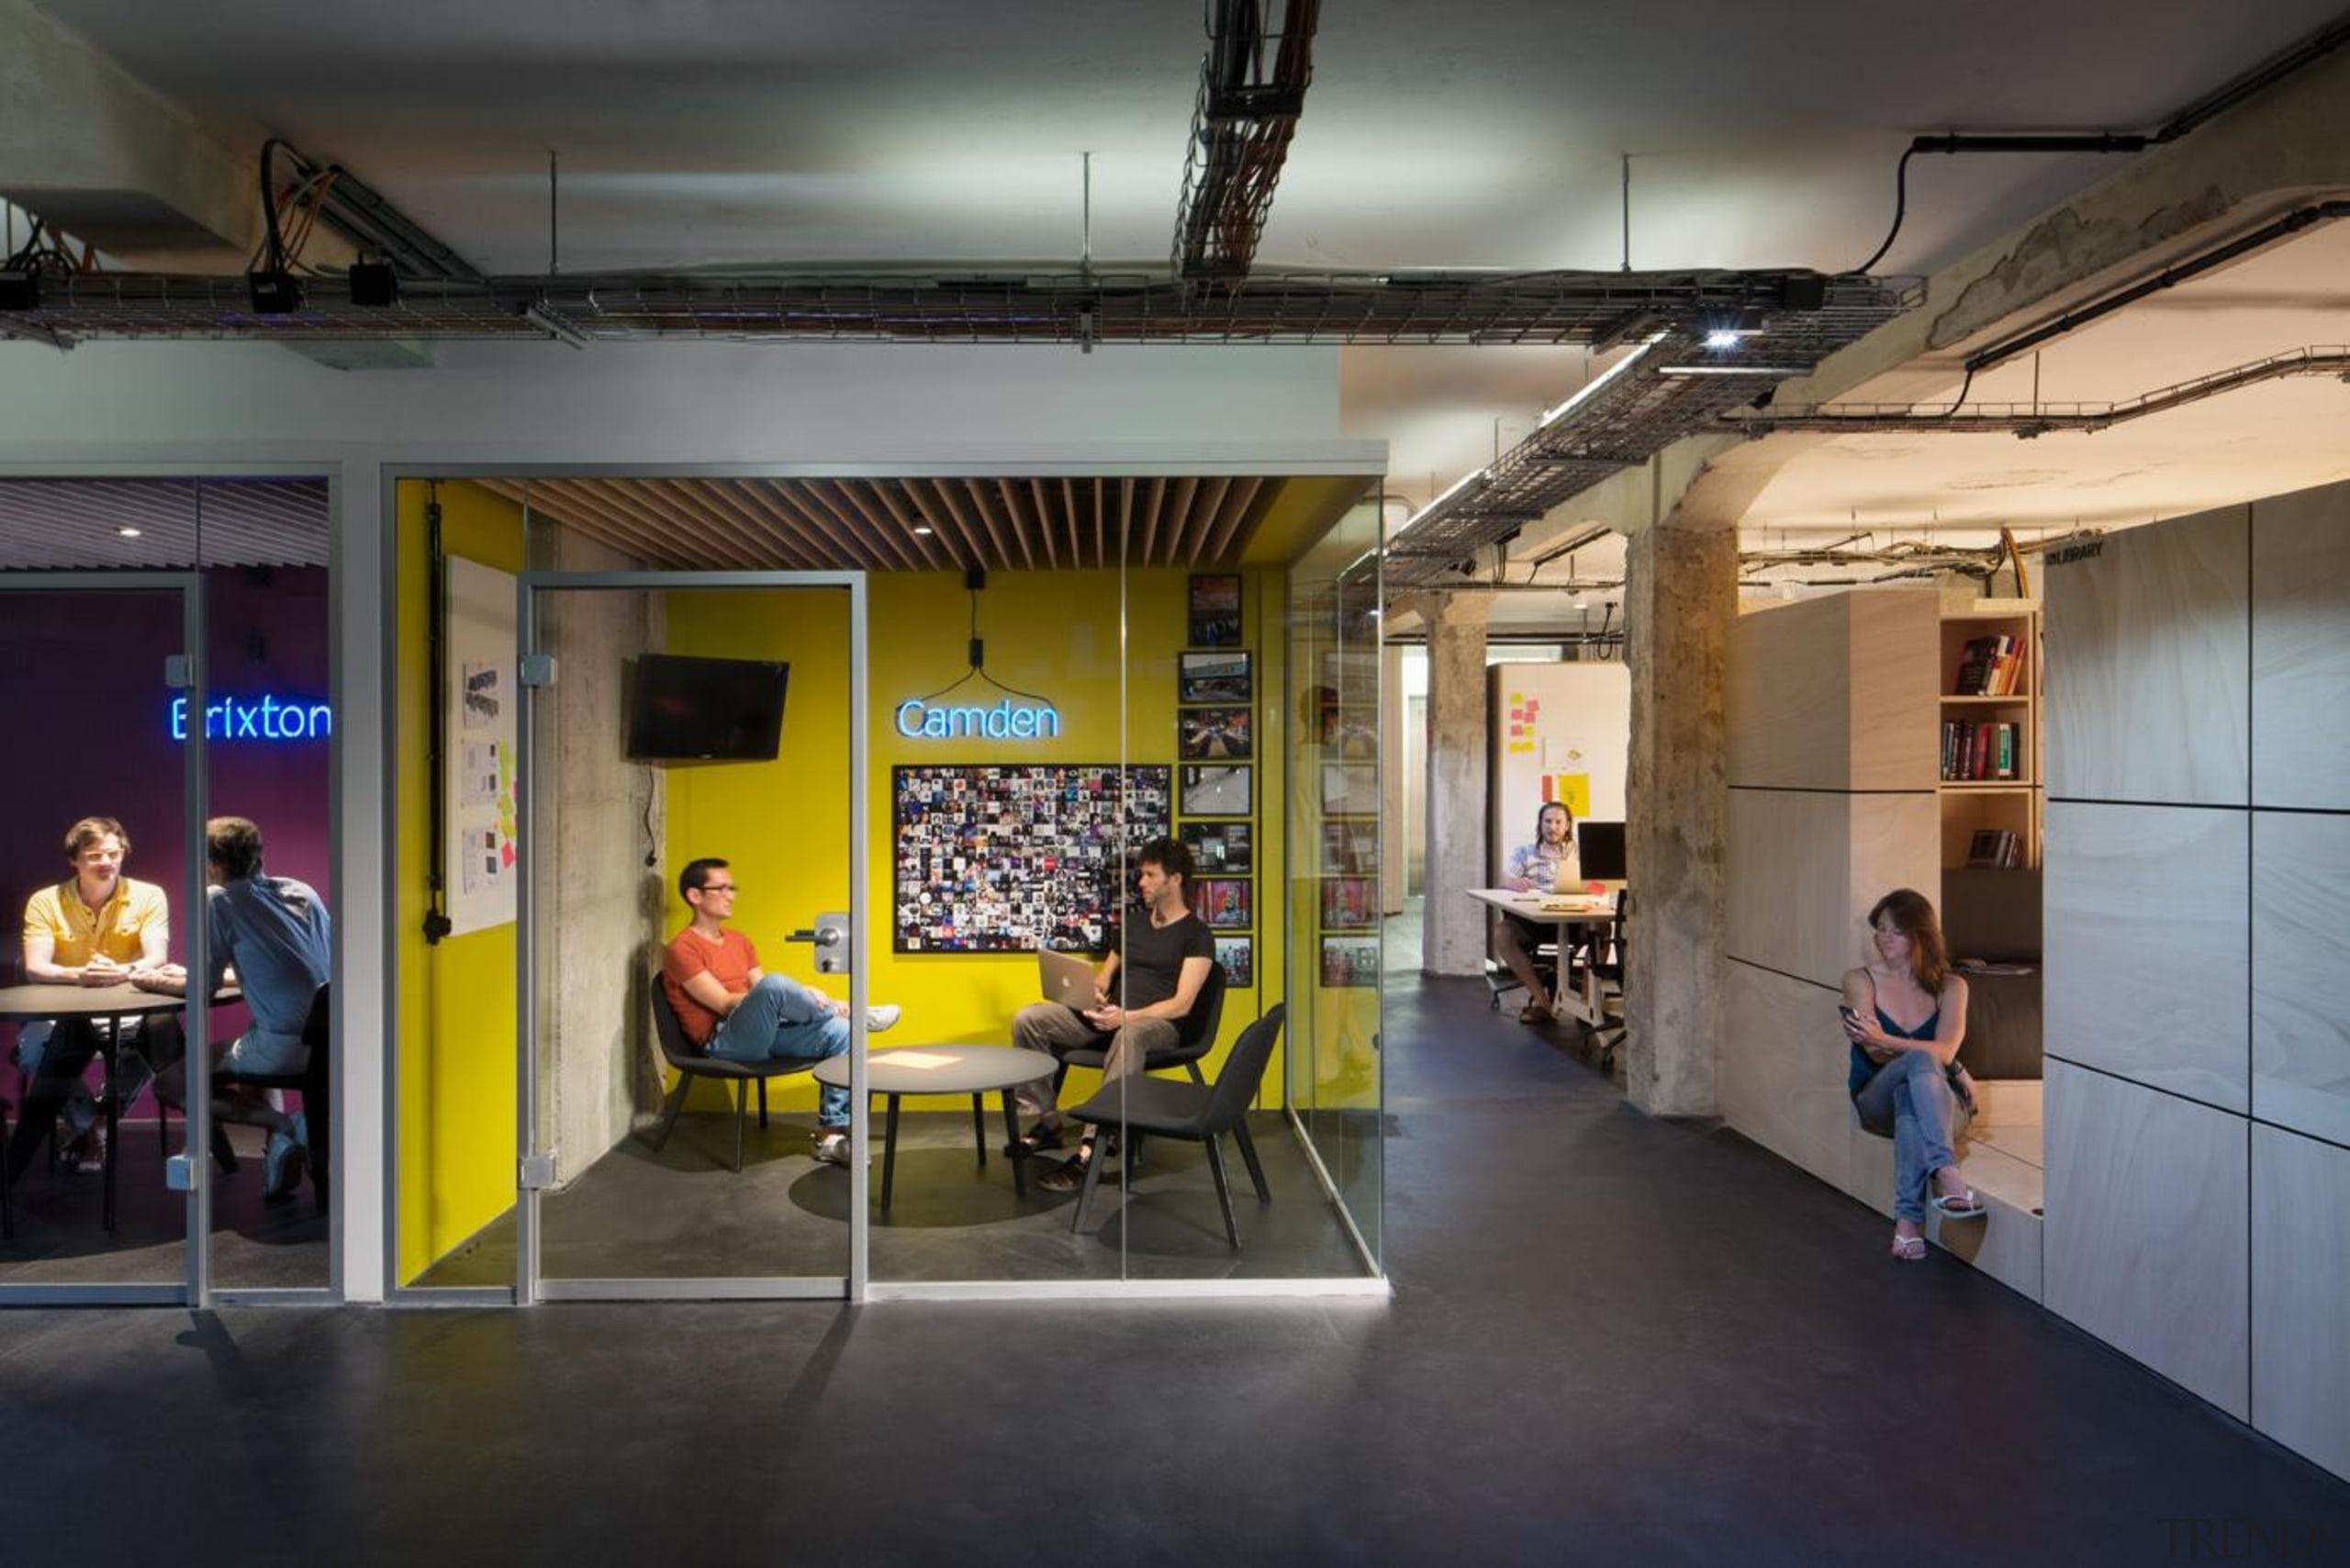 Online audio platform SoundCloud has been one of architecture, institution, interior design, tourist attraction, black, gray